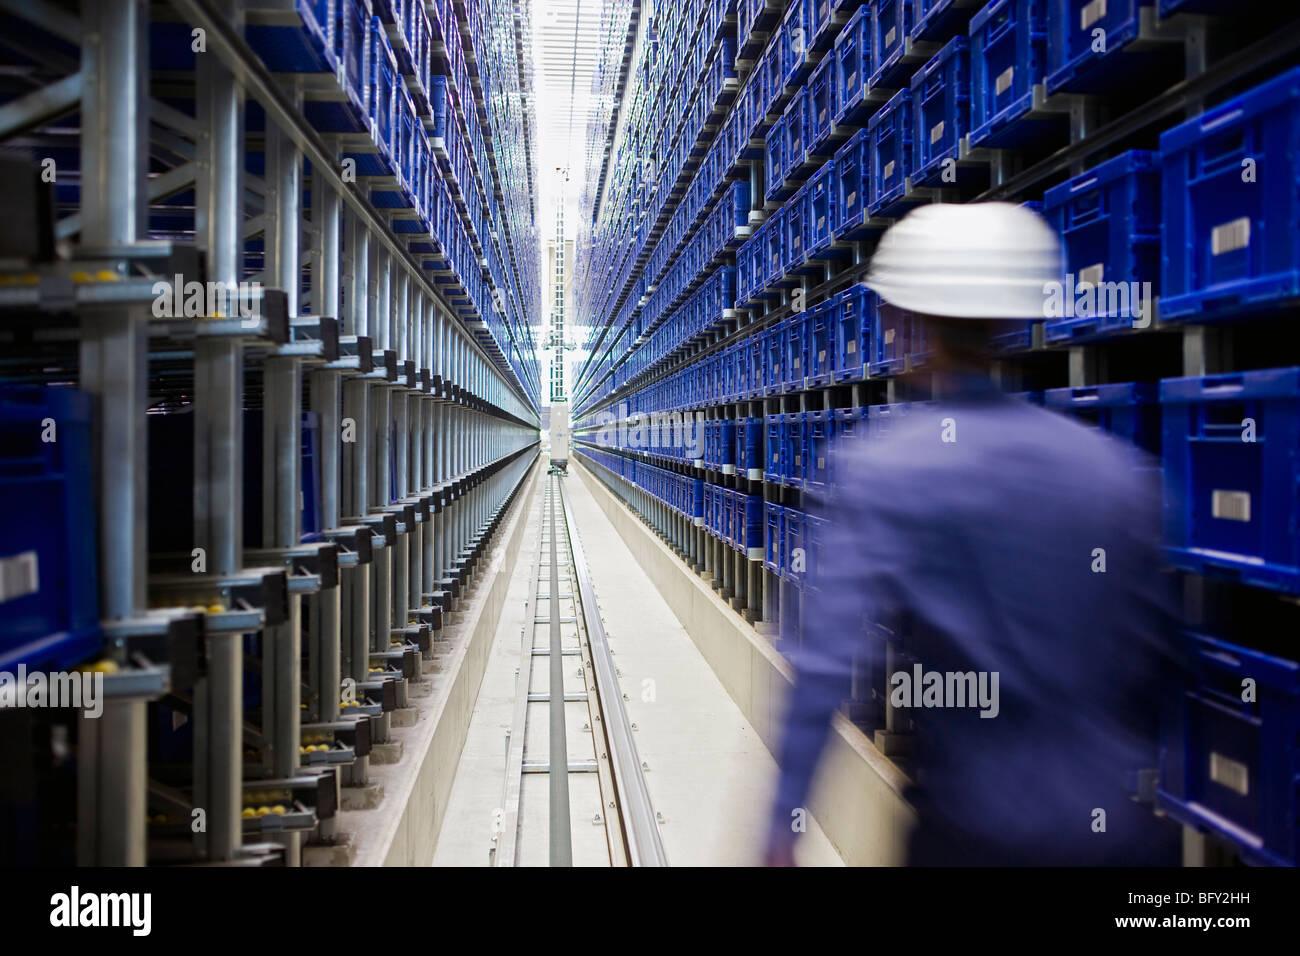 workman in storage - Stock Image